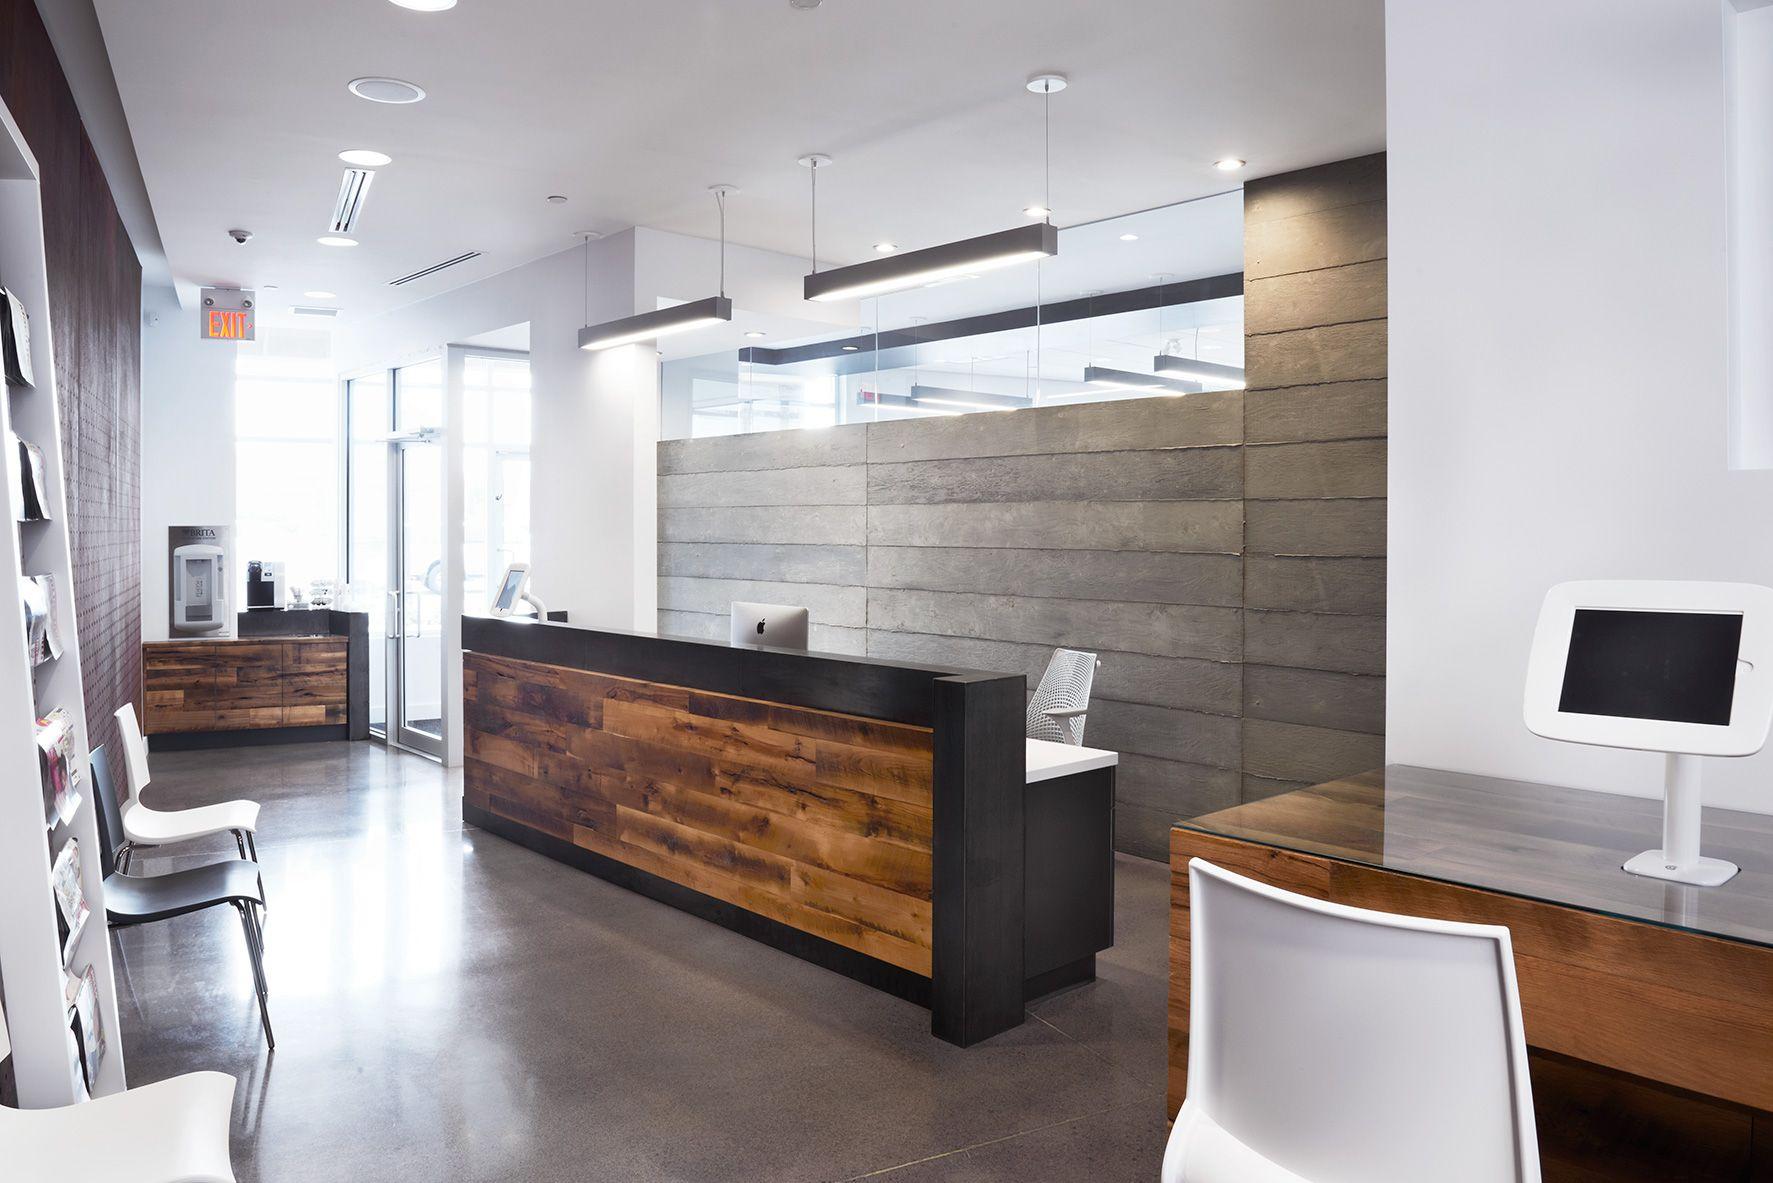 Tiles Wall Cladding Anthony Concrete Design Wall Cladding Office Interior Design Concrete Design